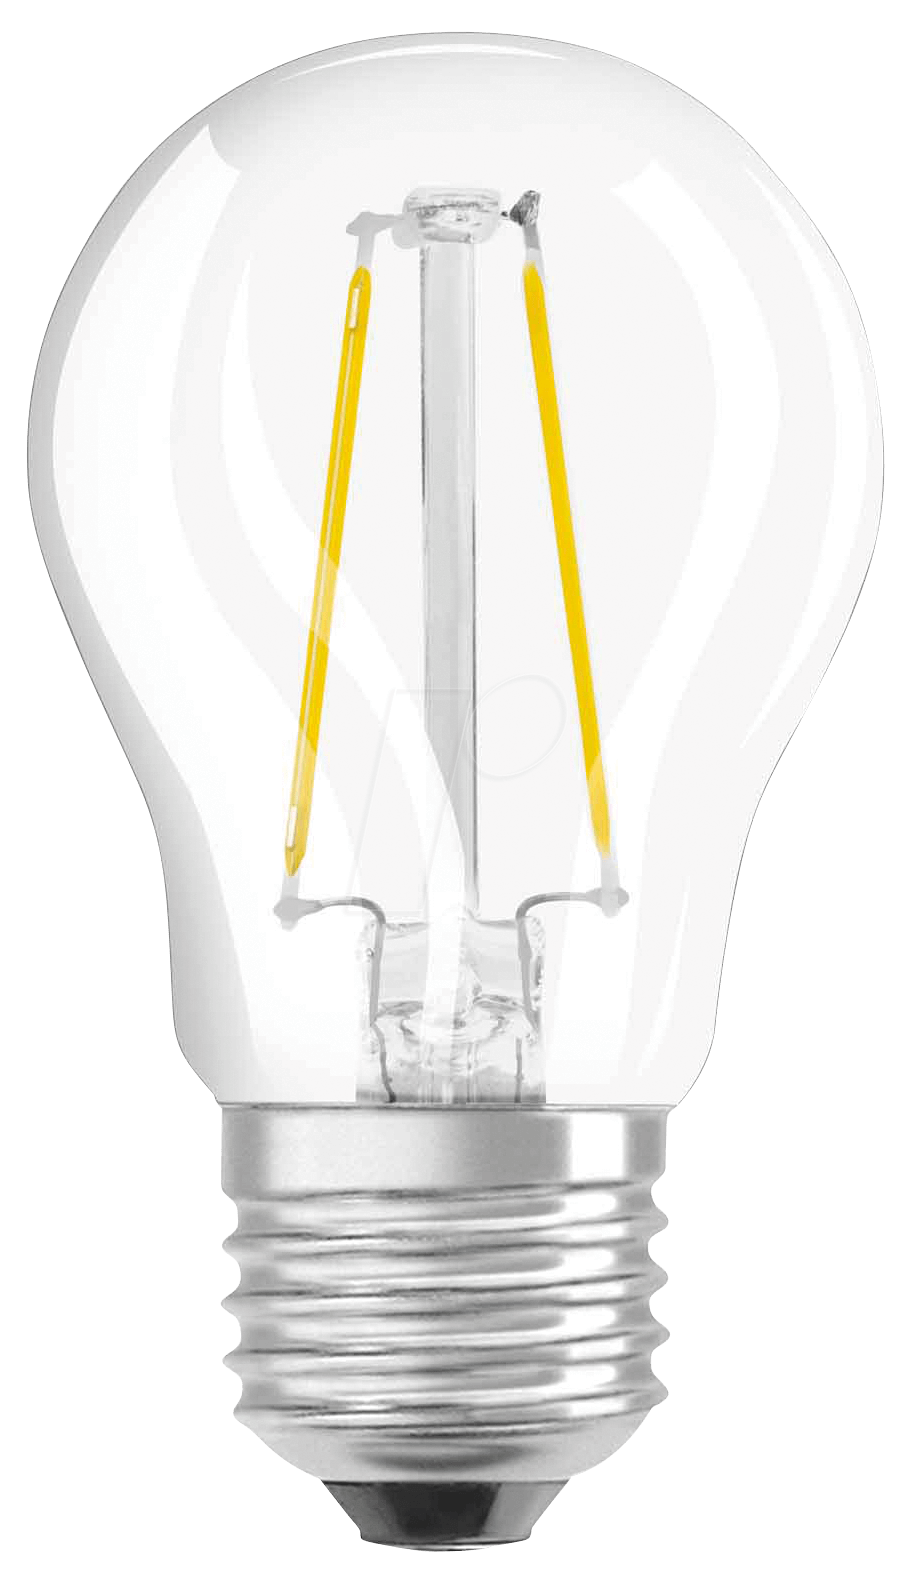 OSR 899400344 - LED-Lampe E27 RETROFIT, 1,2 W, 136 lm, 2700 K, Filament